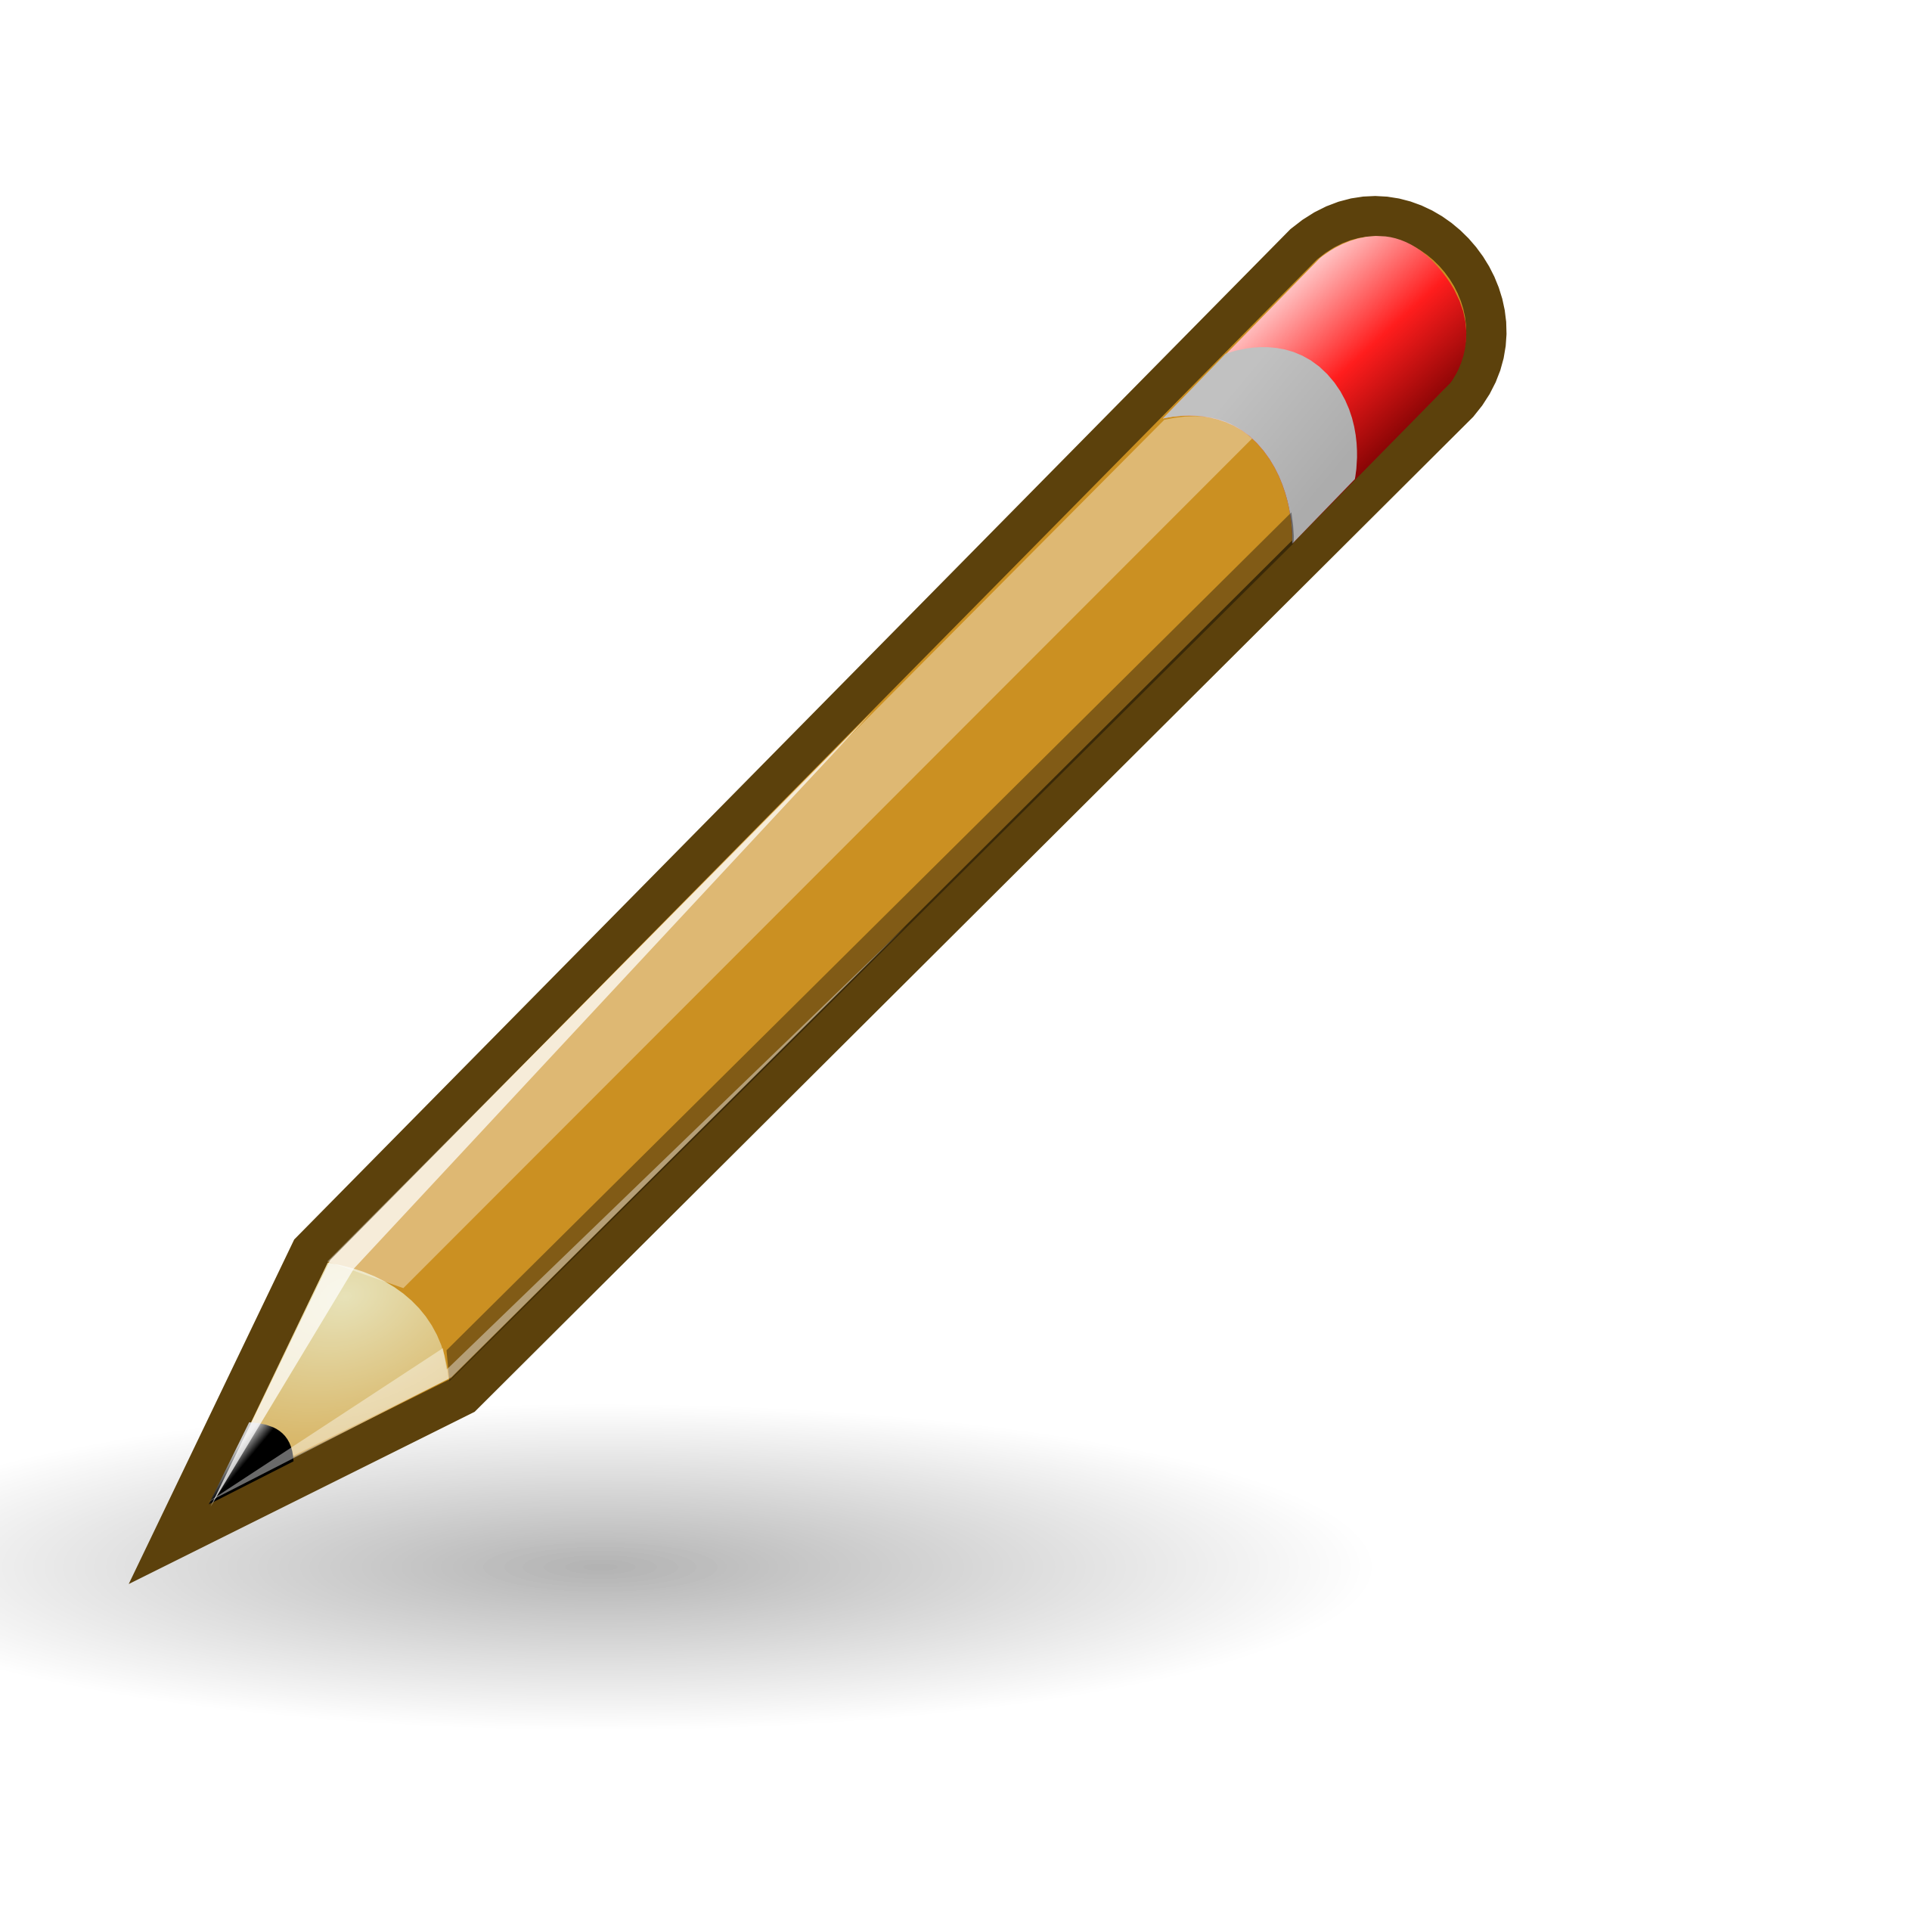 2555x2555 Animated Pencil Clip Art Clipart Image 7